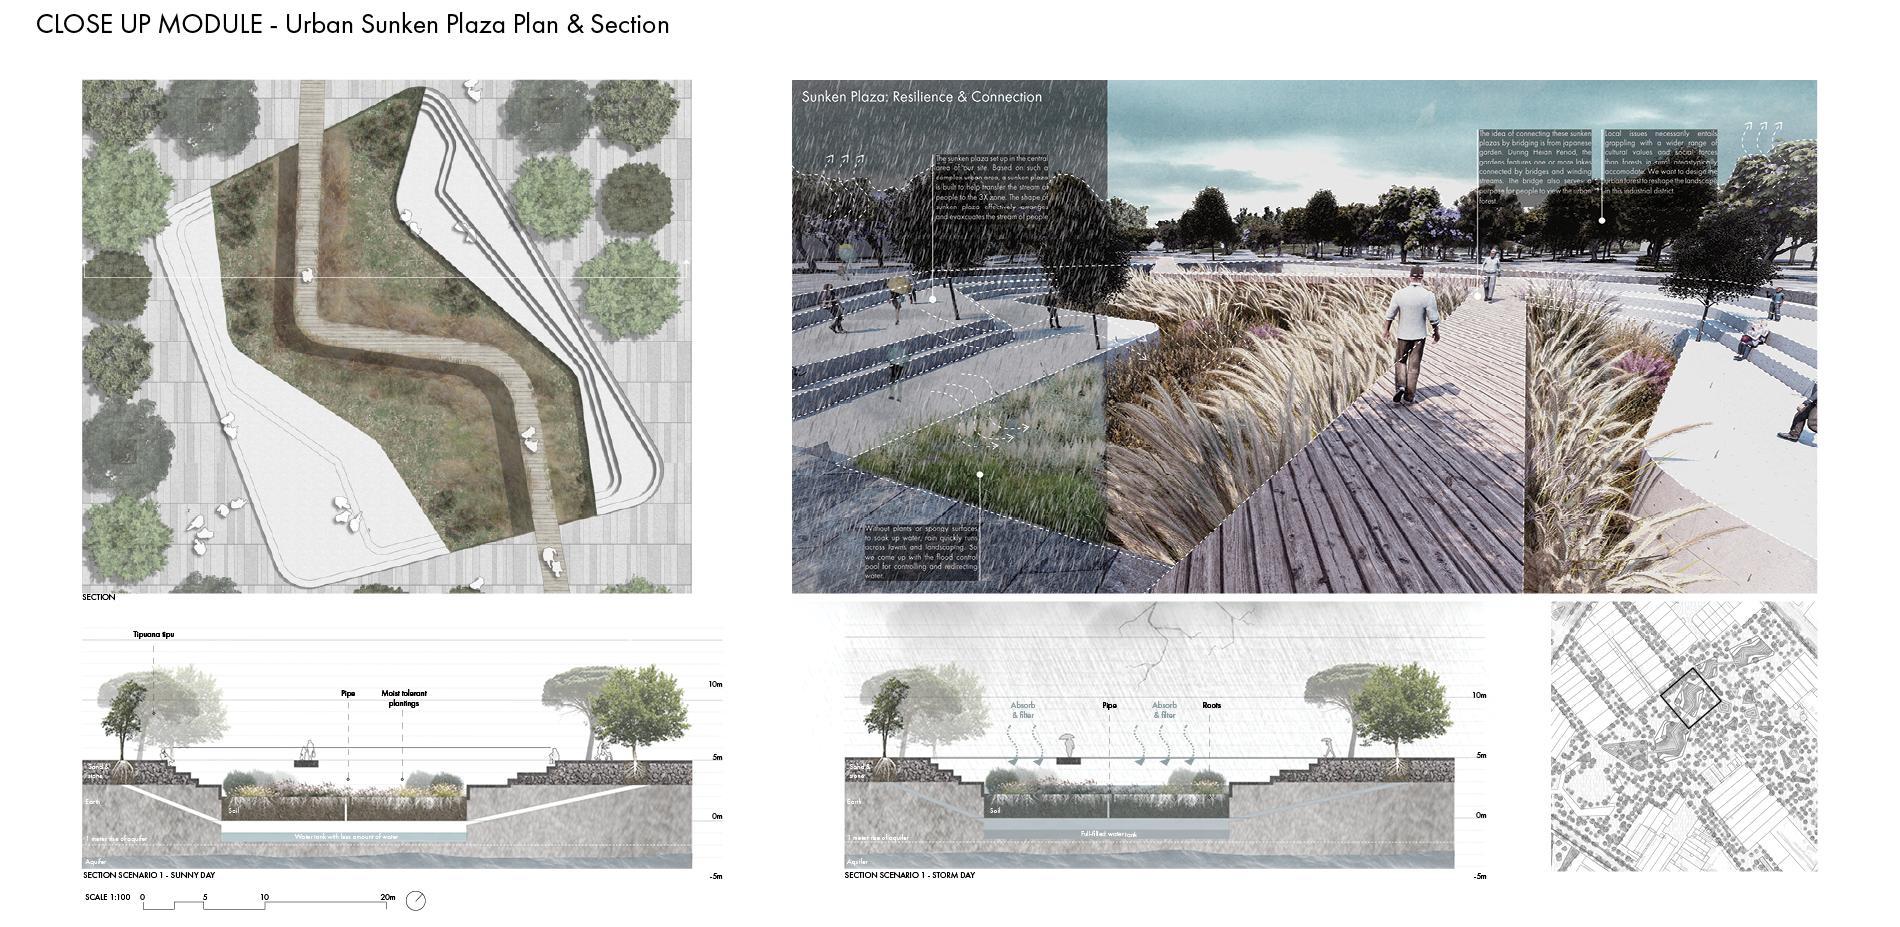 Close Up Module - Urban Sunken Plaza